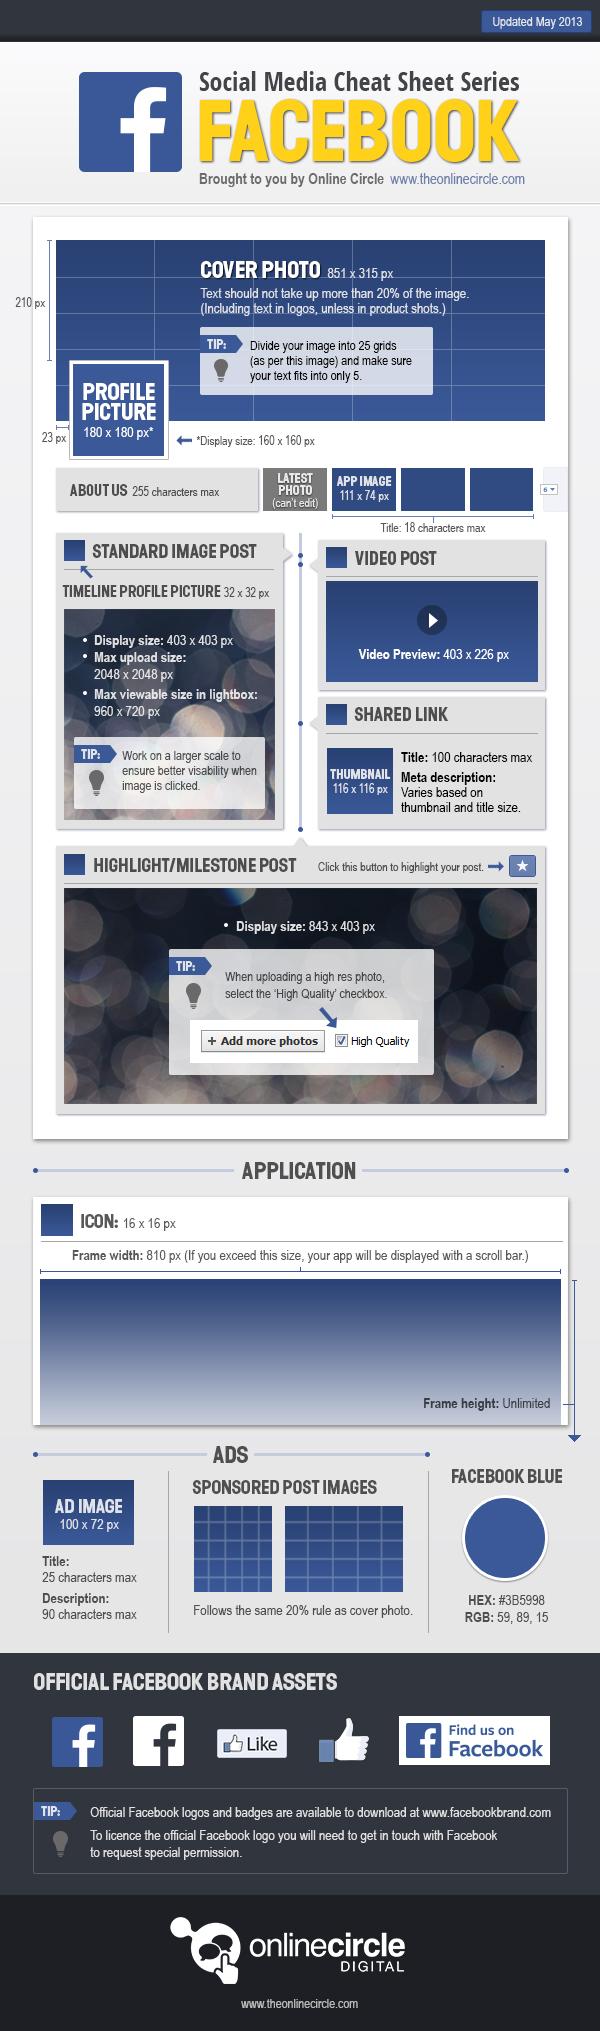 OnlineCircle_Infographics_SocialMediaCheatSheets_Facebook_v6